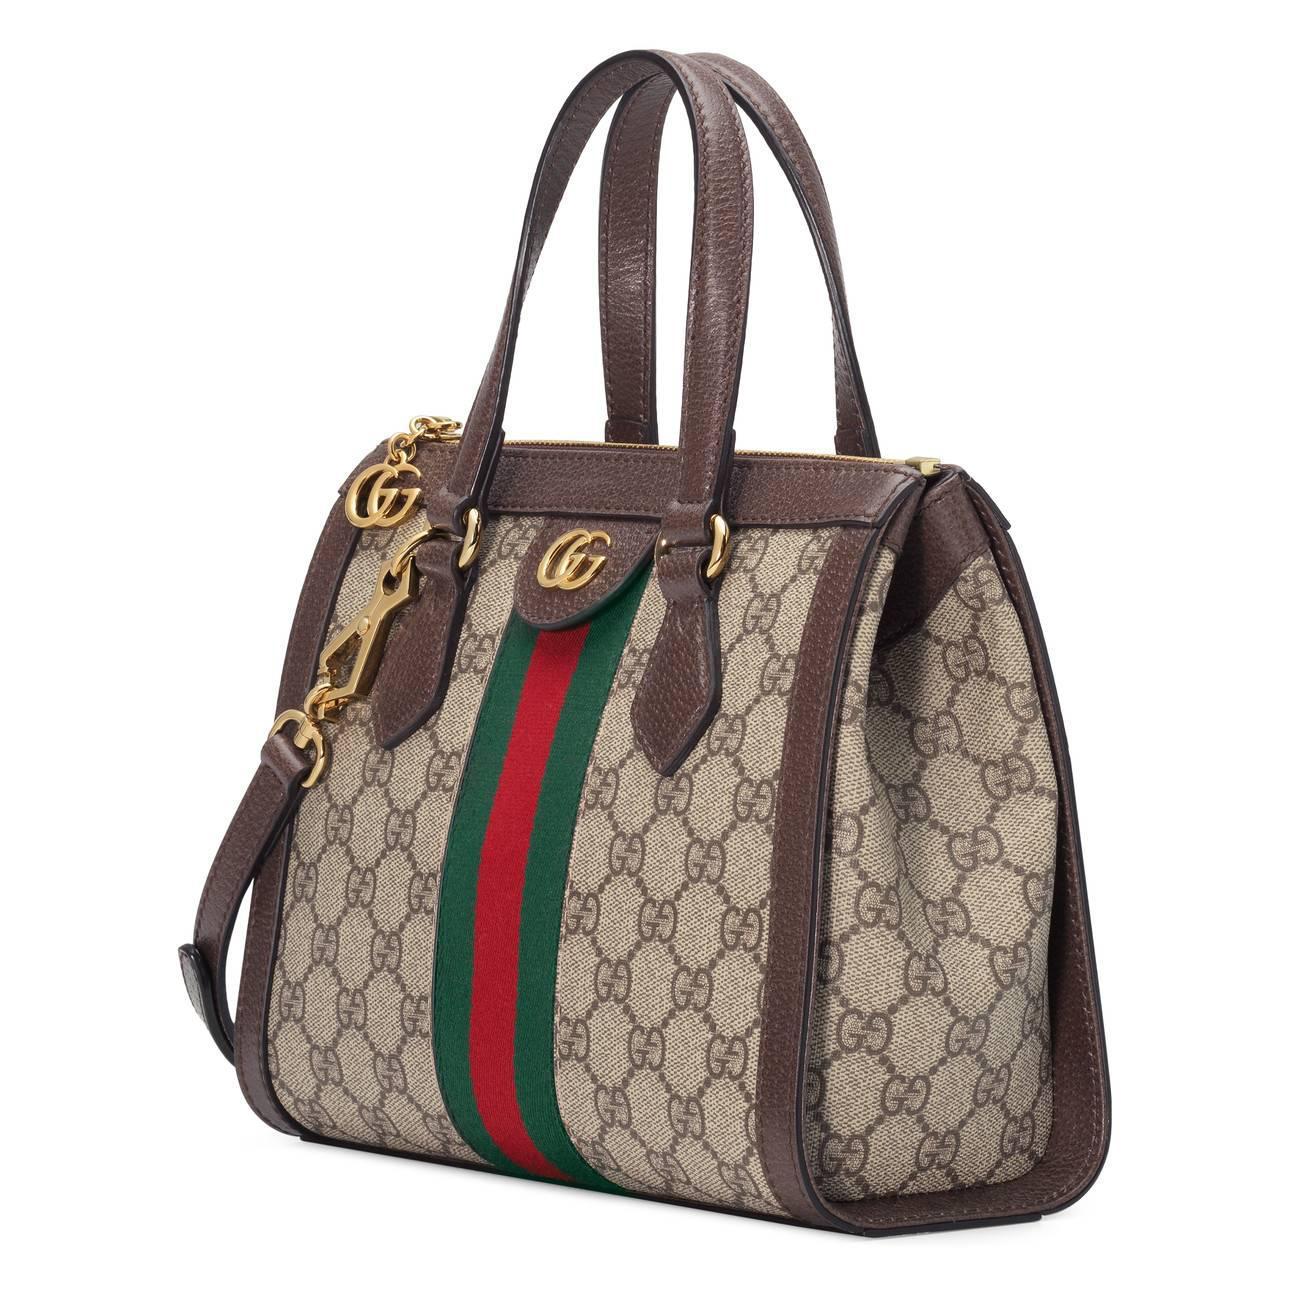 a0b1a34c2587 Gucci - Green Ophidia Small GG Tote Bag - Lyst. View fullscreen